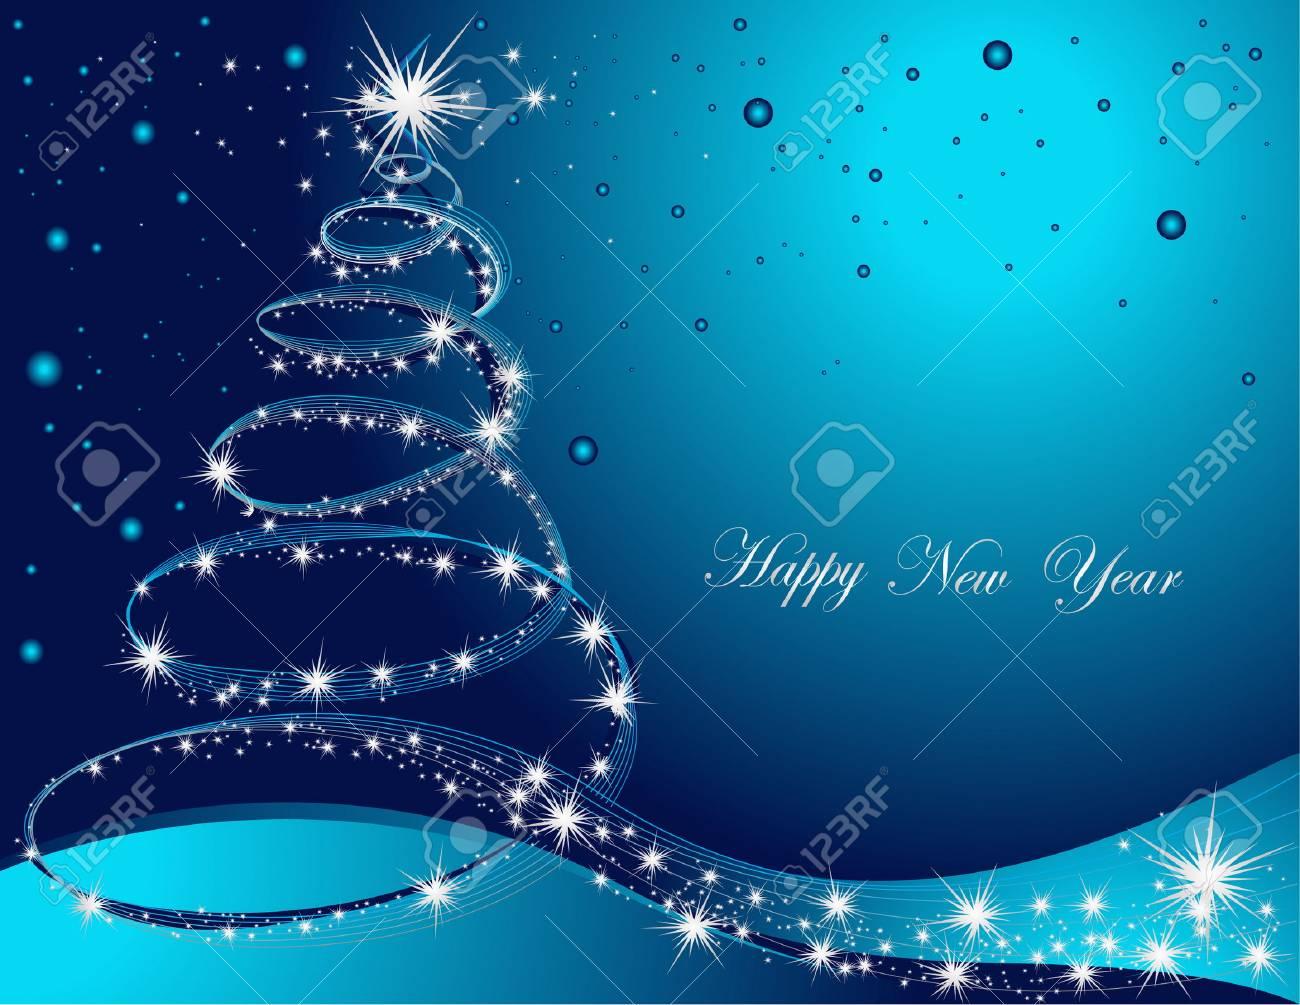 Happy New Year Stock Vector - 5953157